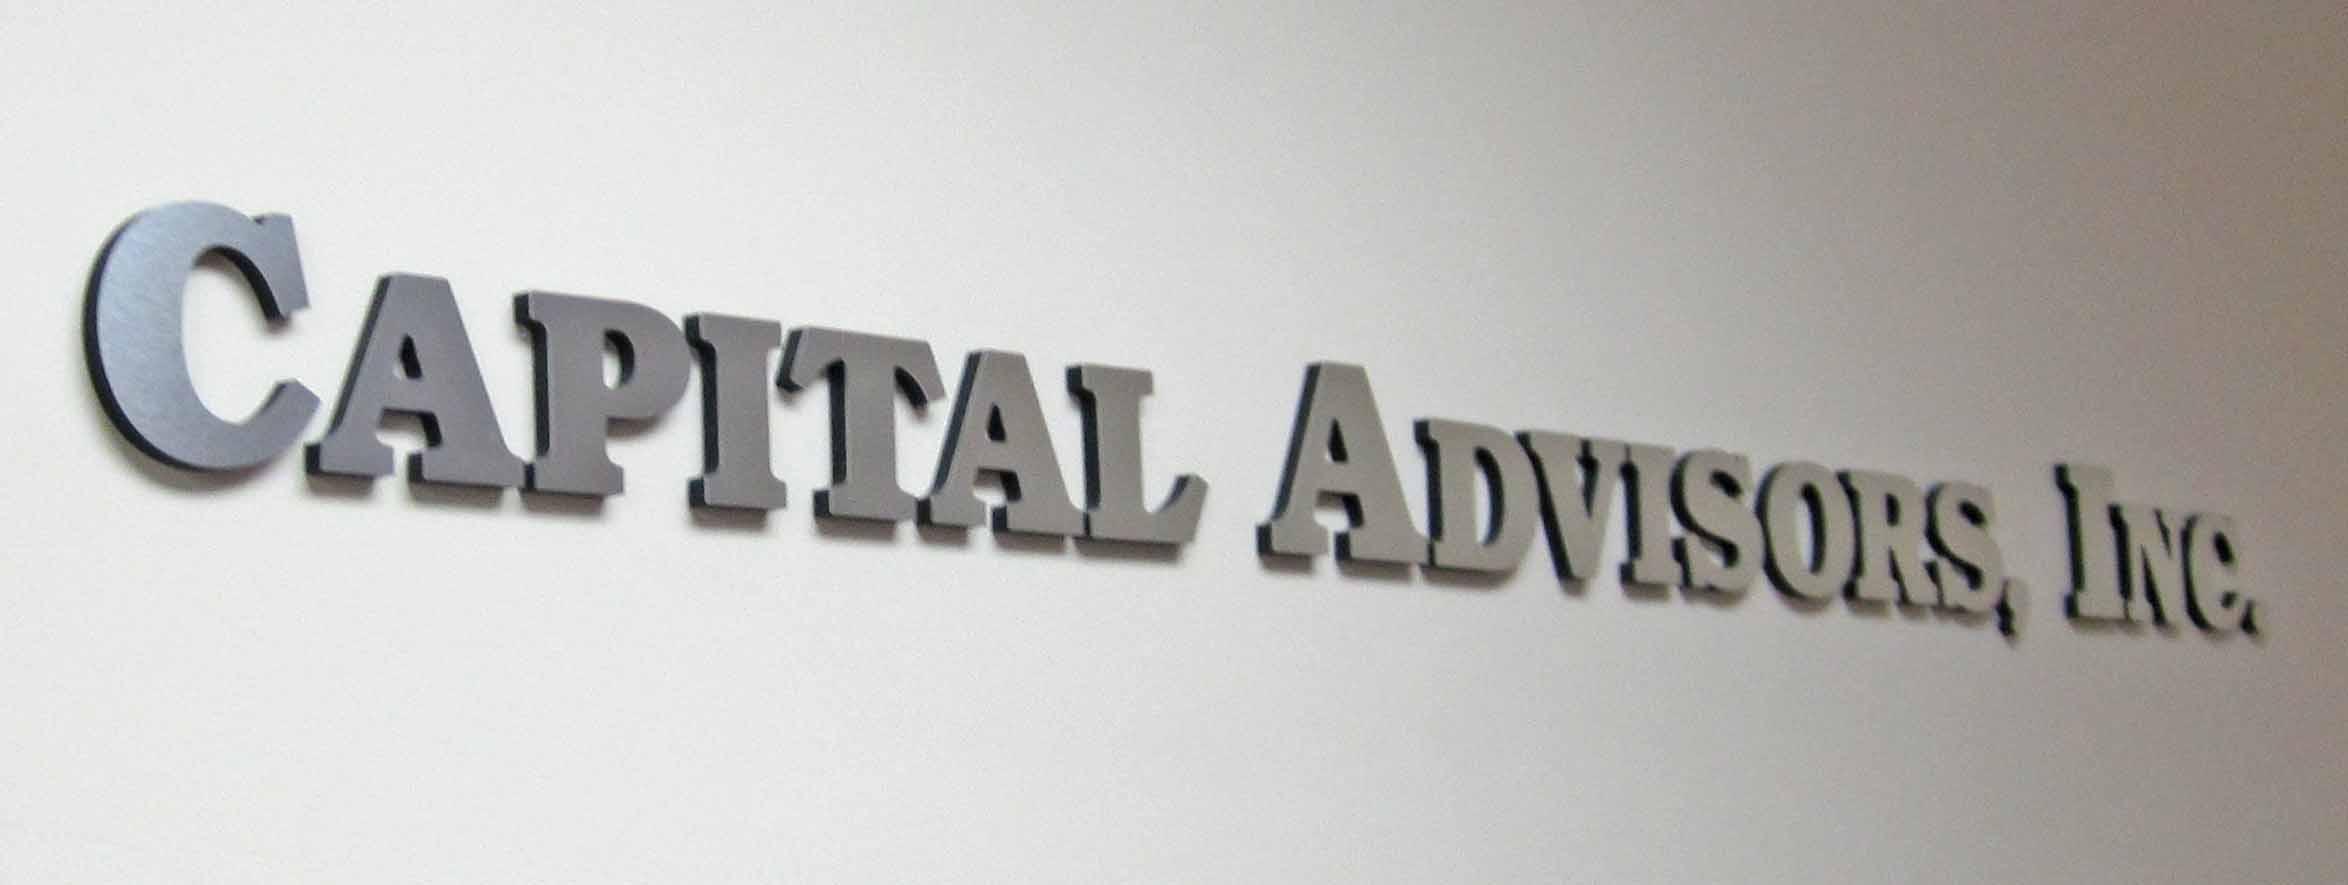 Business Valuation | Capital Advisors, Inc  | St  Louis, Missouri